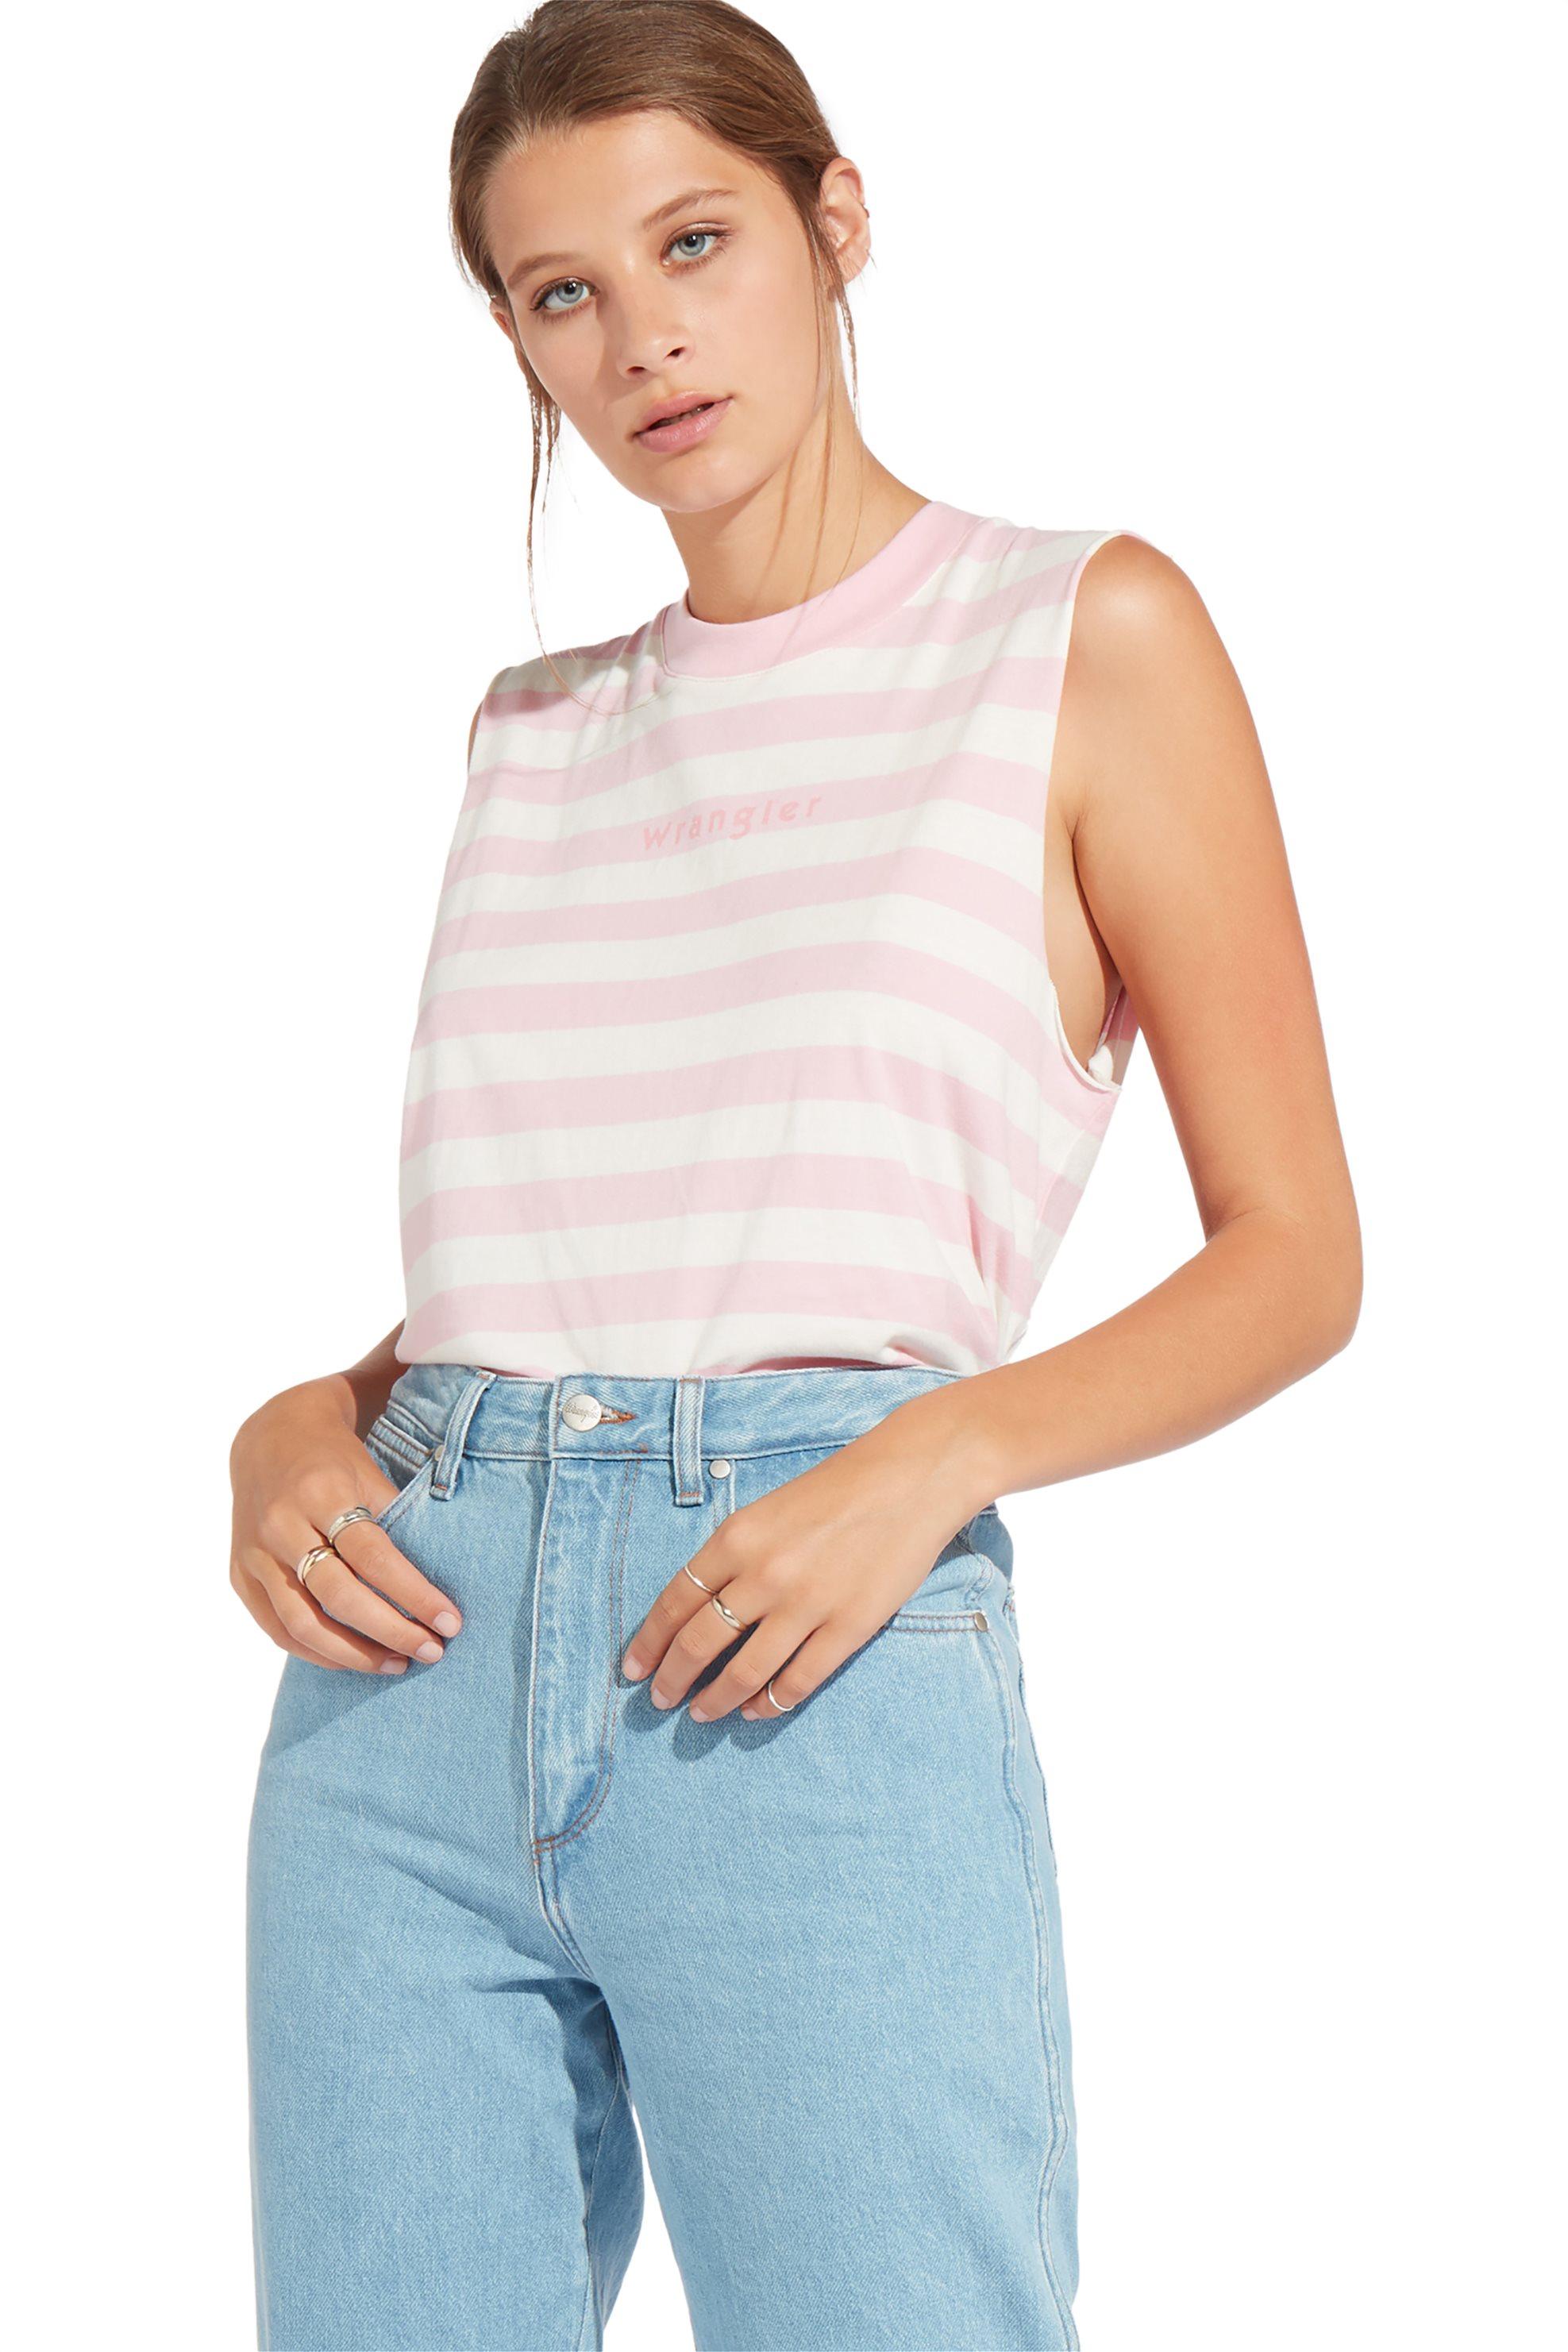 Wrangler γυναικεία αμάνικη μπλούζα 80's Tank Cameo Pink - W7014EWY2 - Ροζ γυναικα   ρουχα   tops   αμάνικα